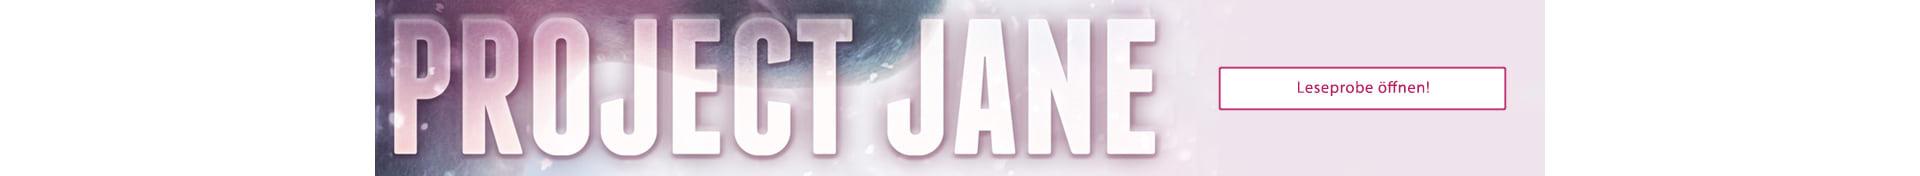 Project Jane Leseprobe